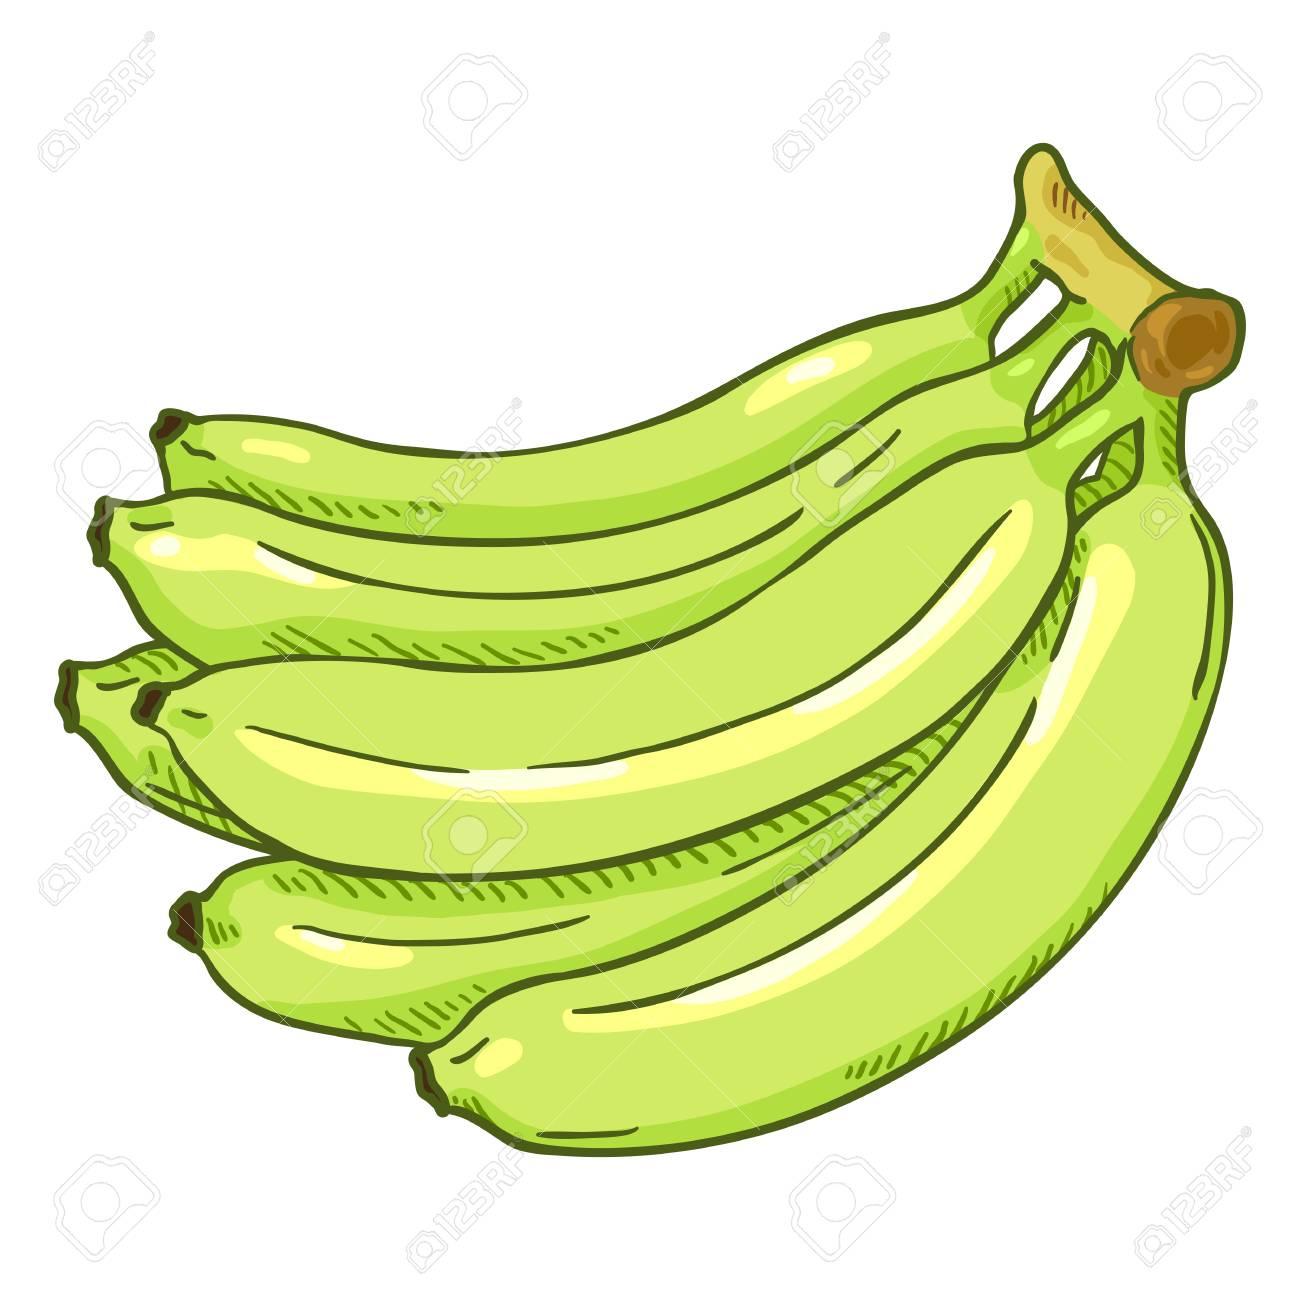 Banana Clipart png download - 494*600 - Free Transparent Cartoon png  Download. - CleanPNG / KissPNG